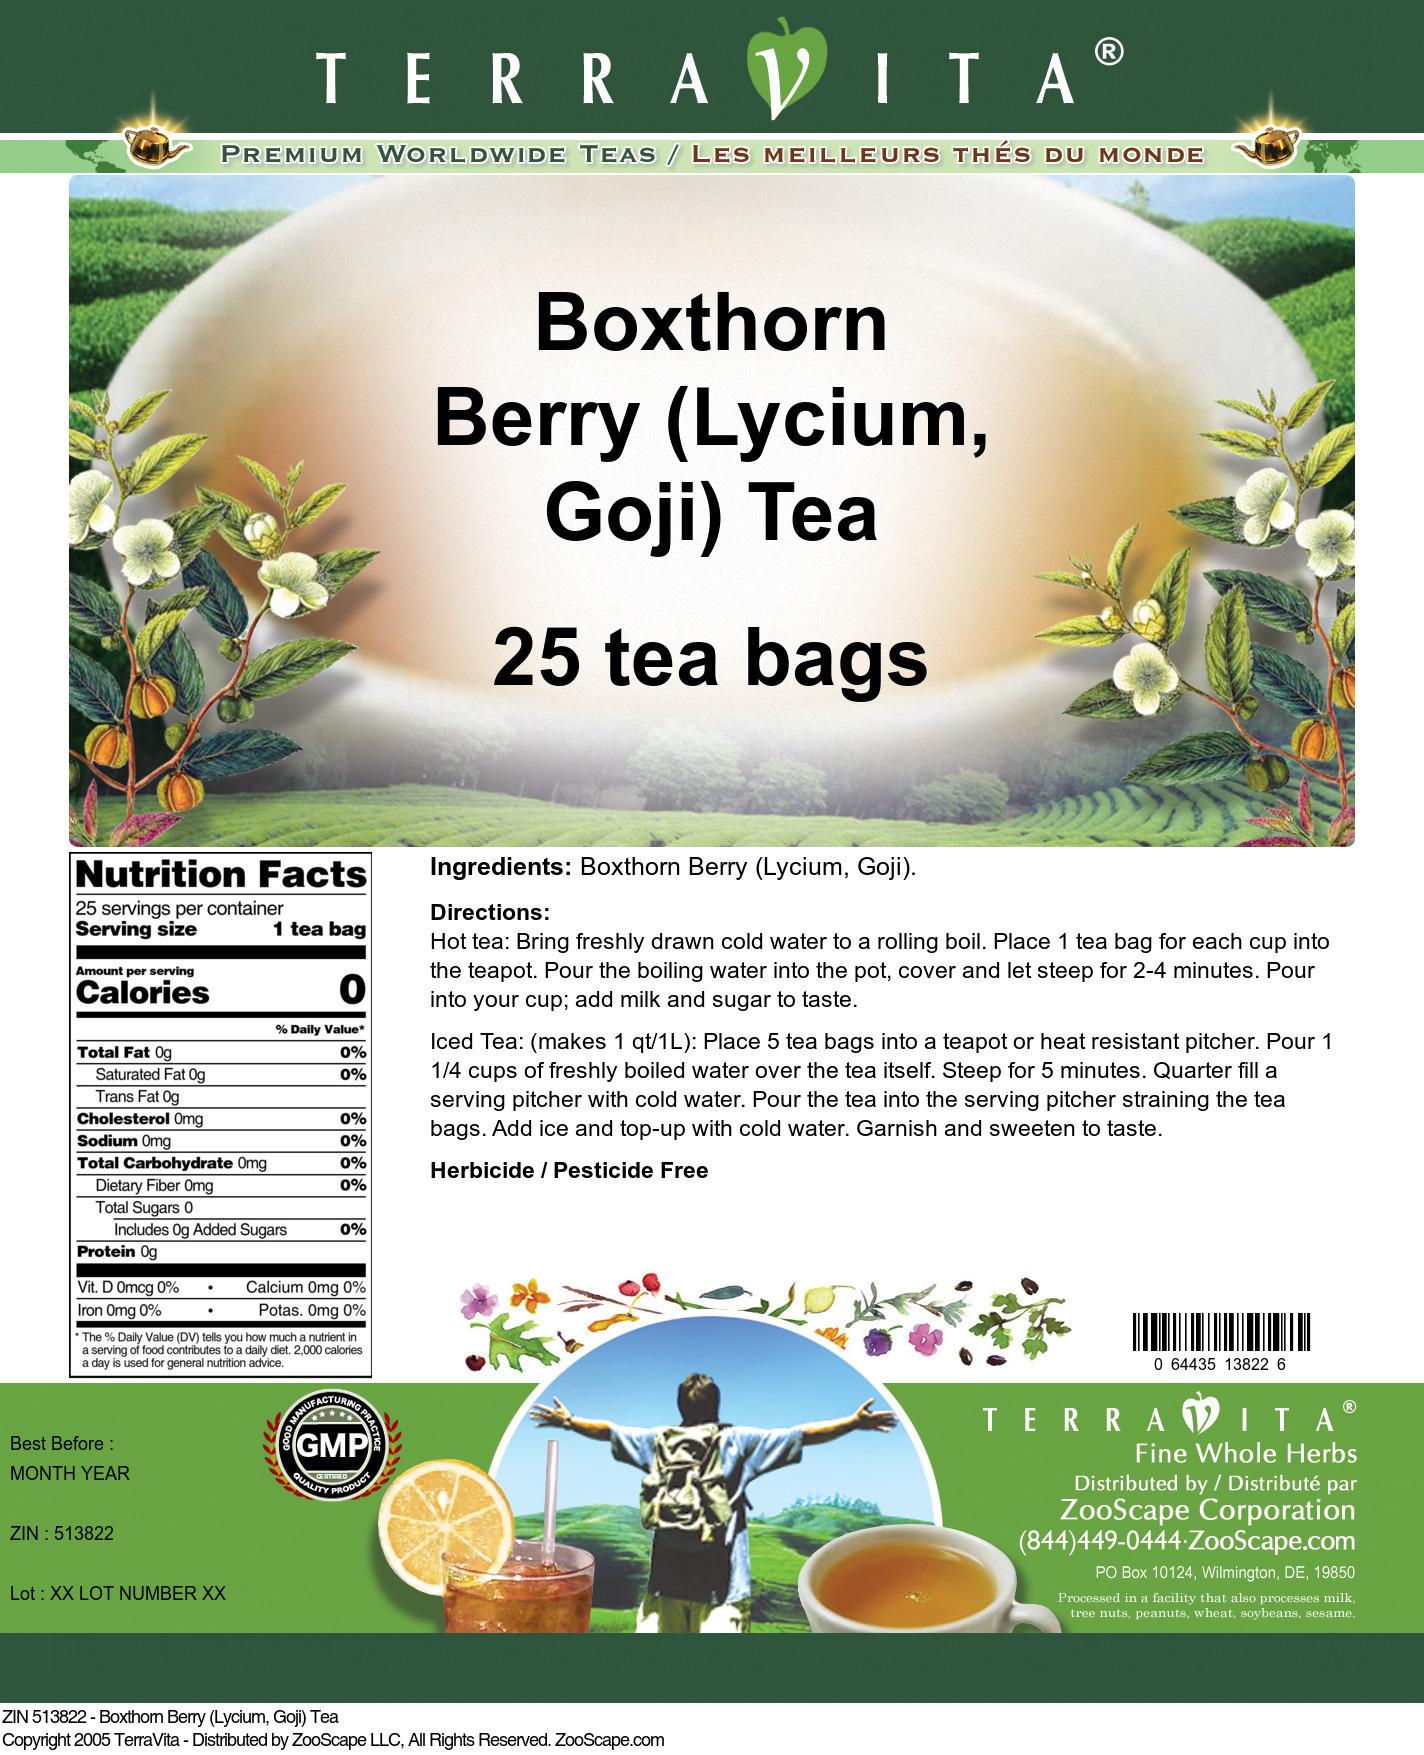 Boxthorn Berry (Lycium, Goji) Tea